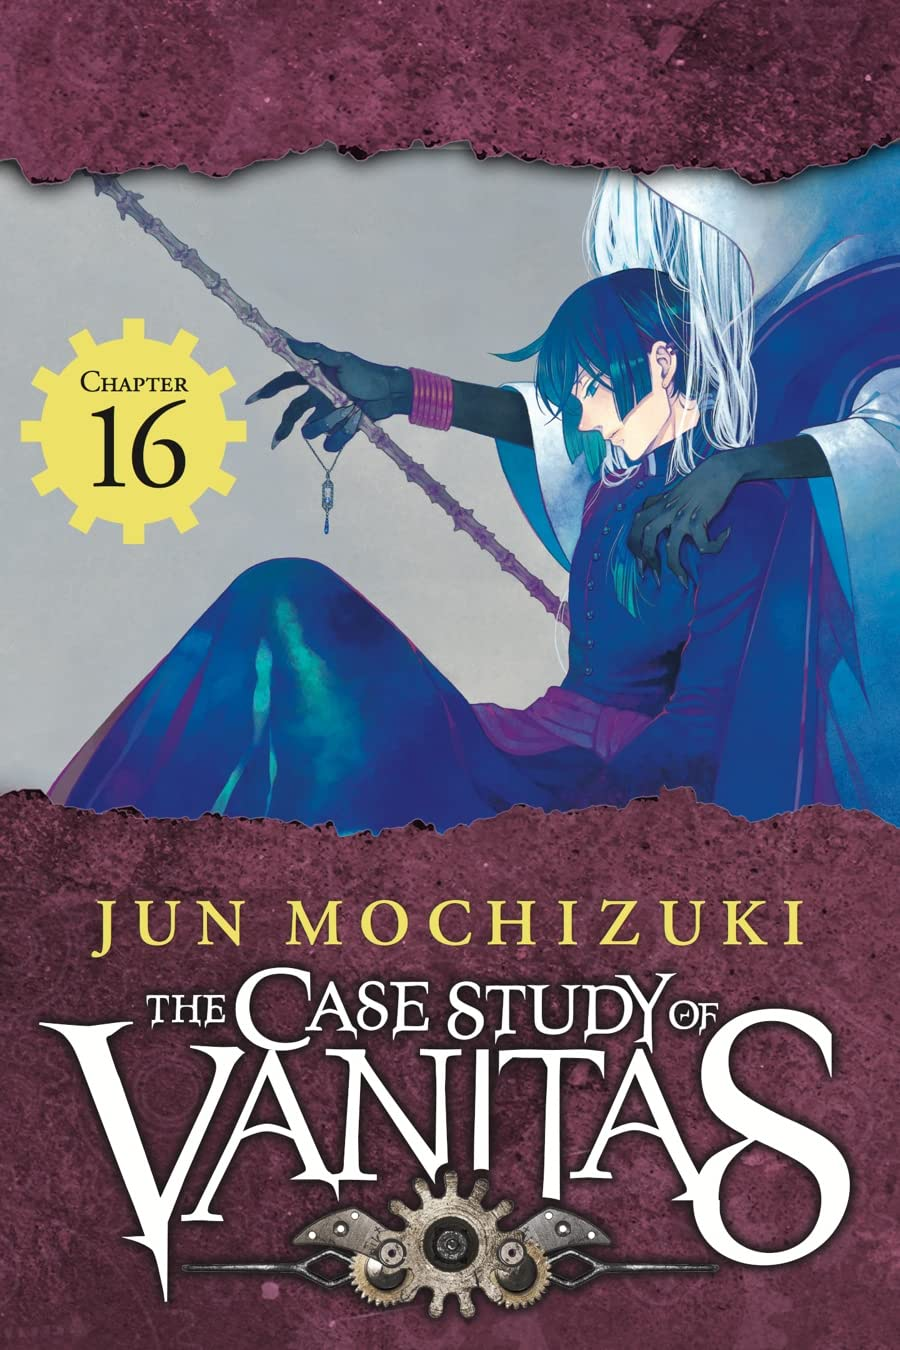 The Case Study of Vanitas #16